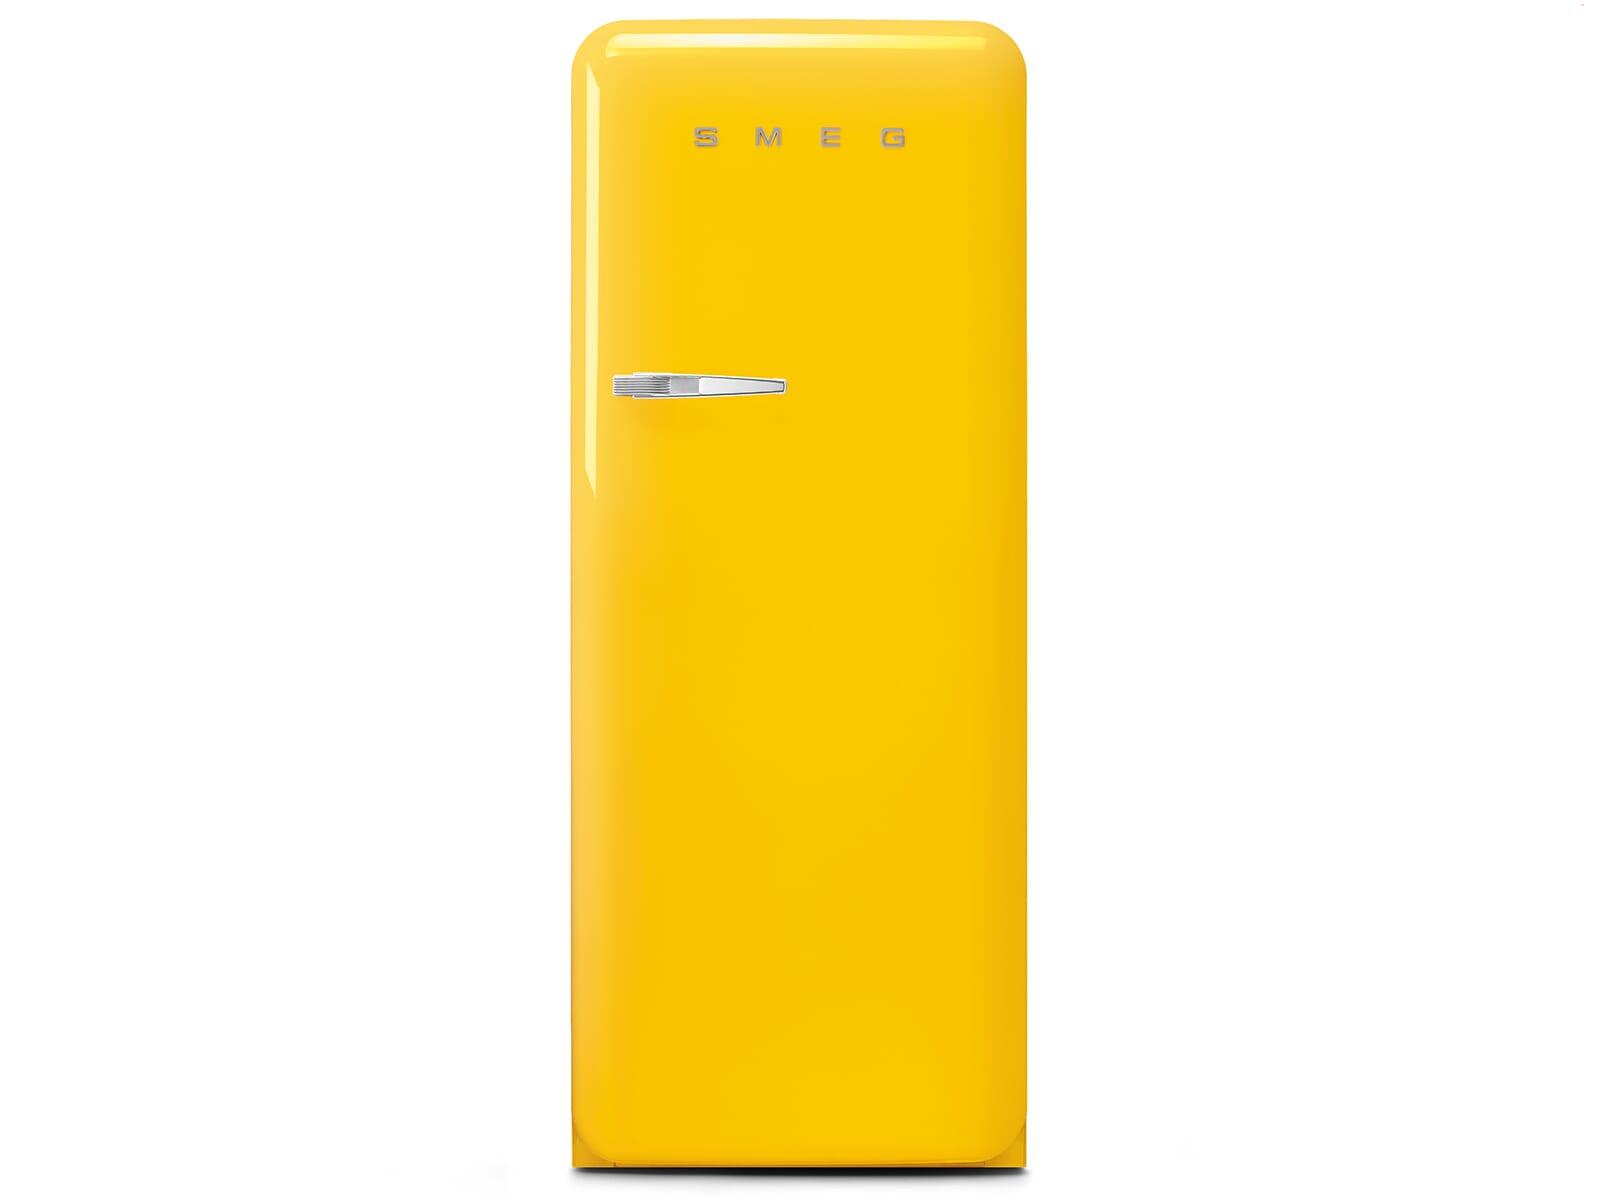 Amica Kühlschrank Retro Türkis : Retro kühlschrank ohne gefrierfach retro kühlschrank gebraucht